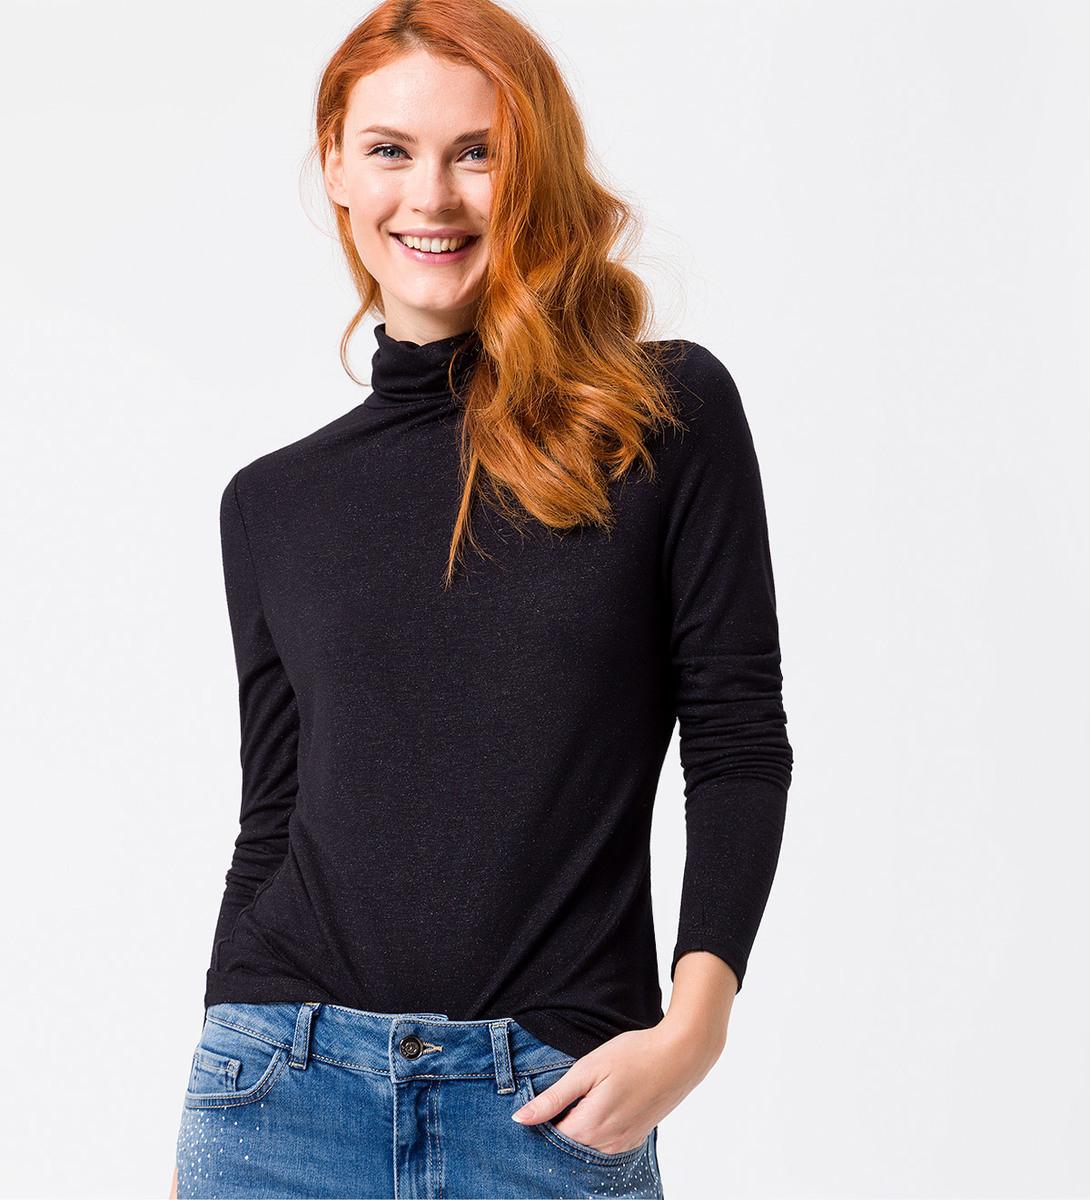 Shirt mit Glitzereffekt in black